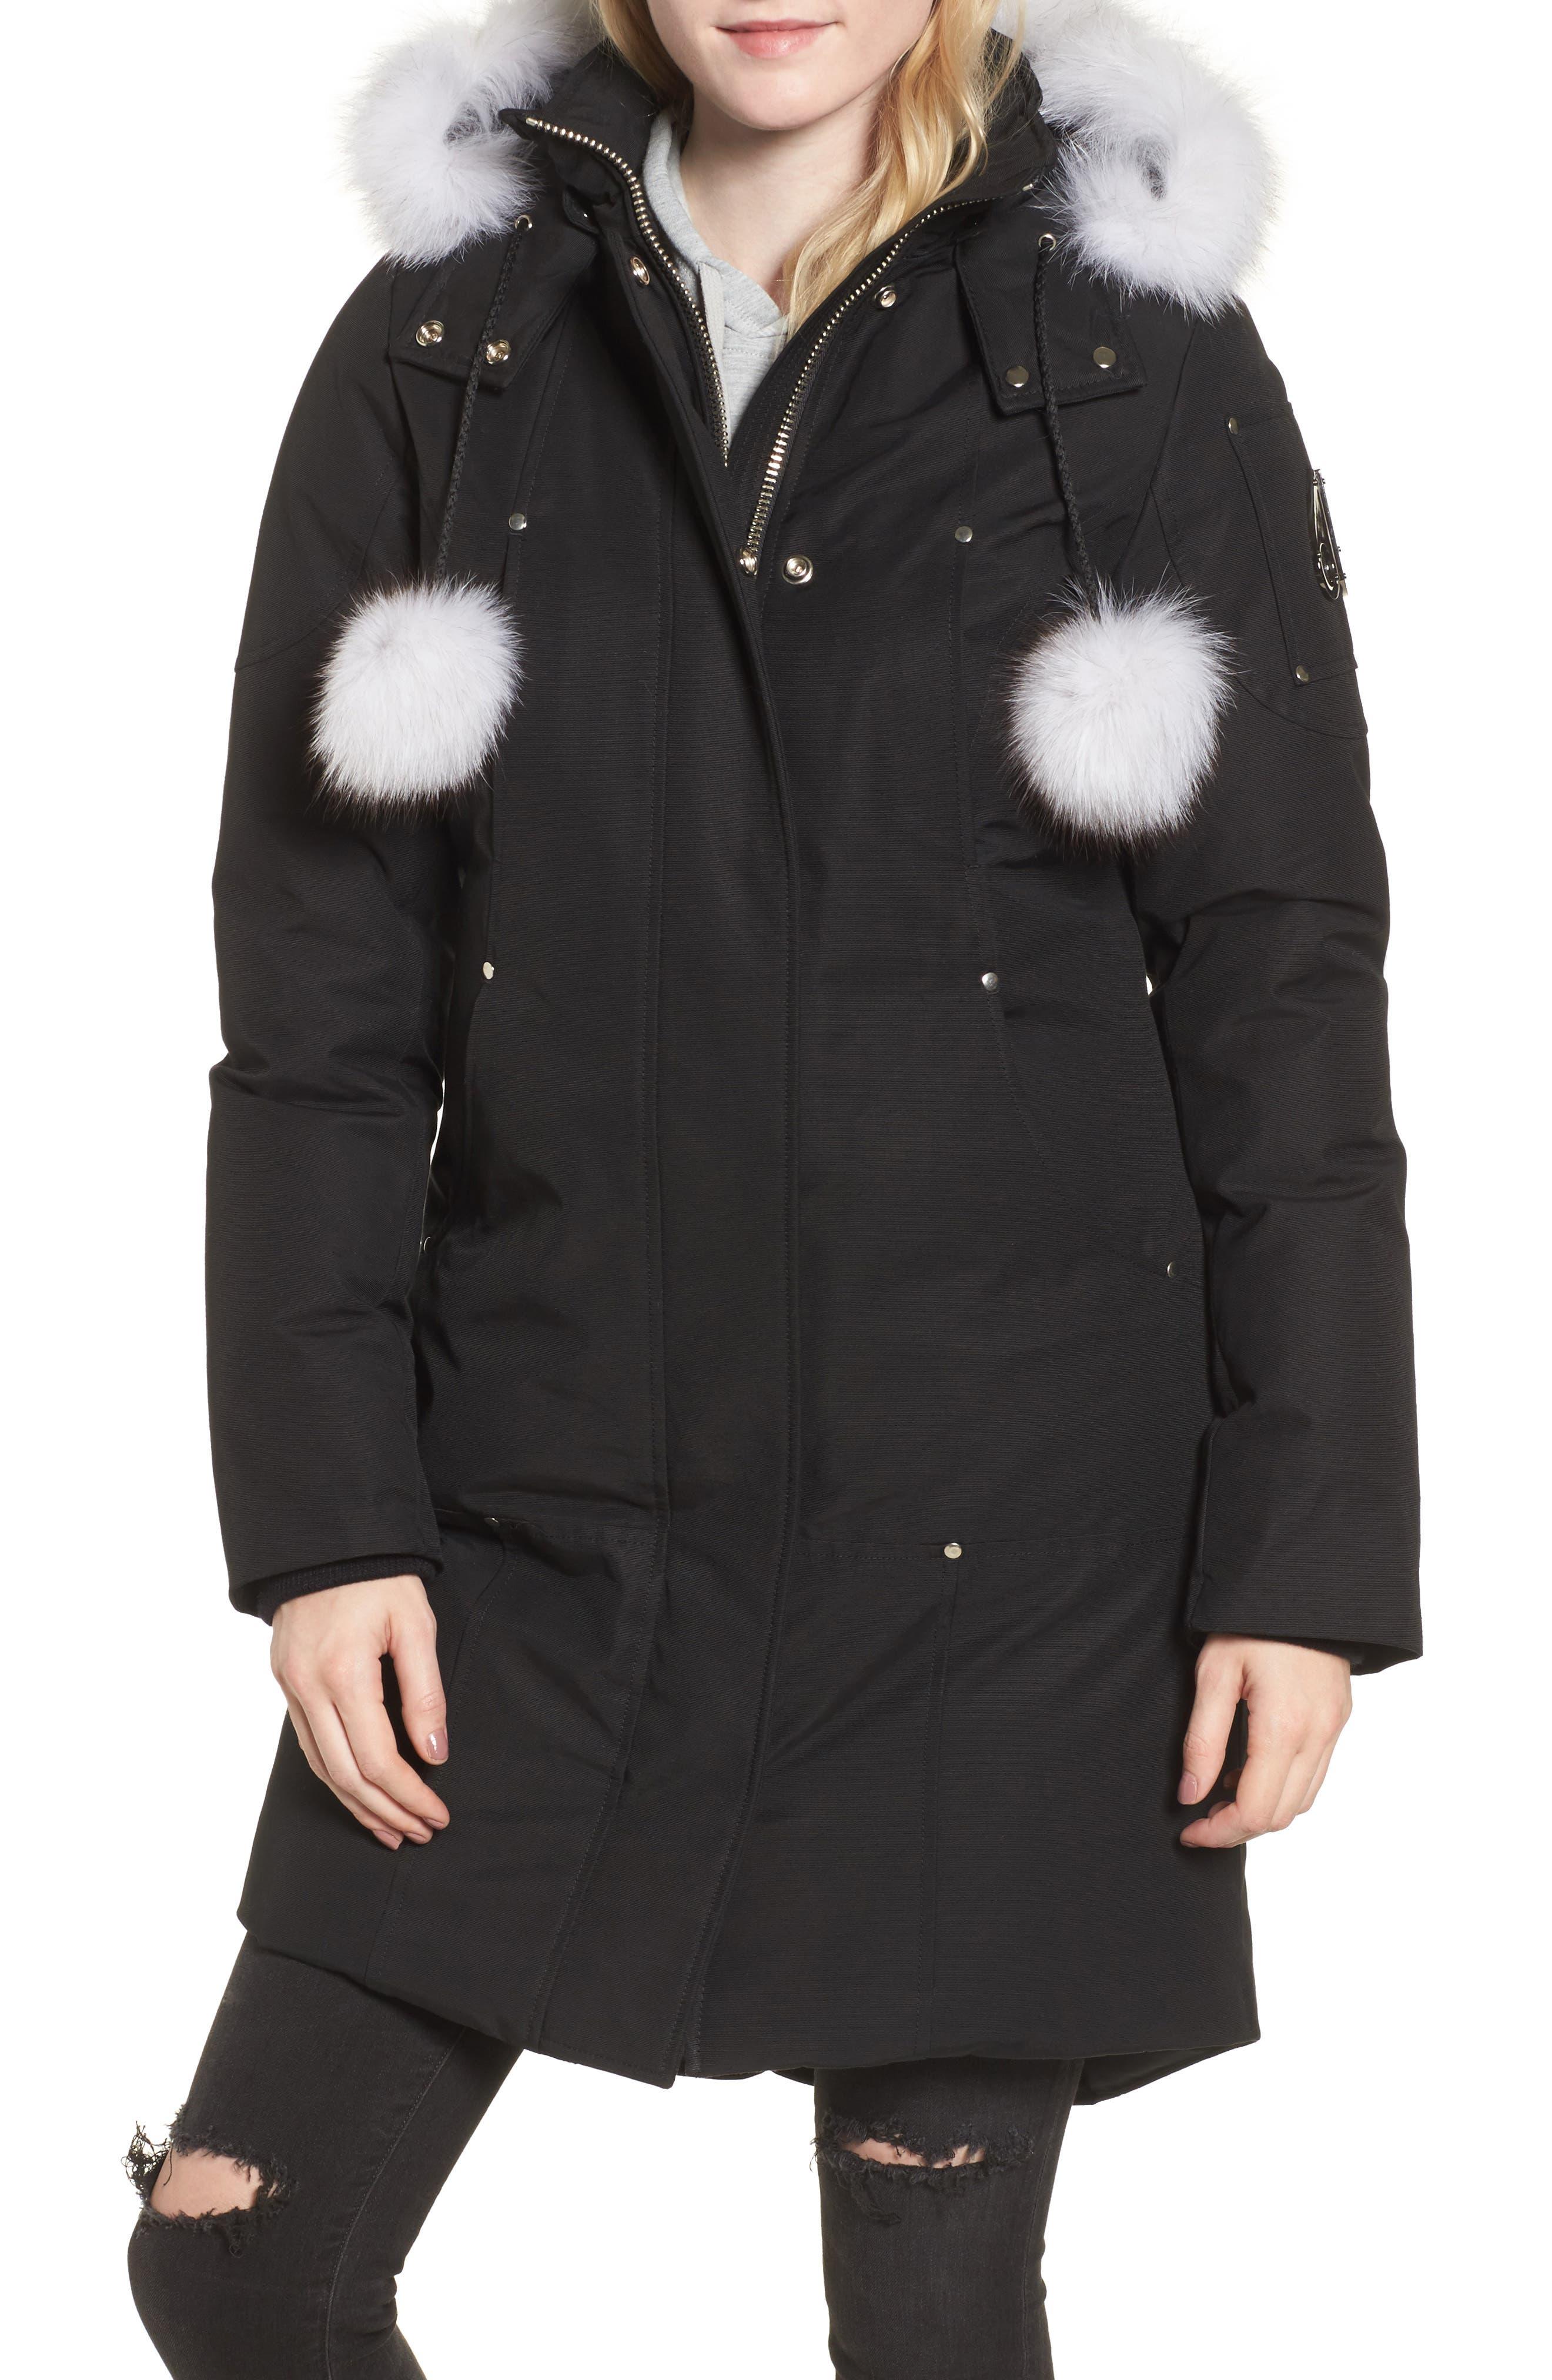 Moose Knuckles 'Stirling' Down Parka with Genuine Fox Fur Trim